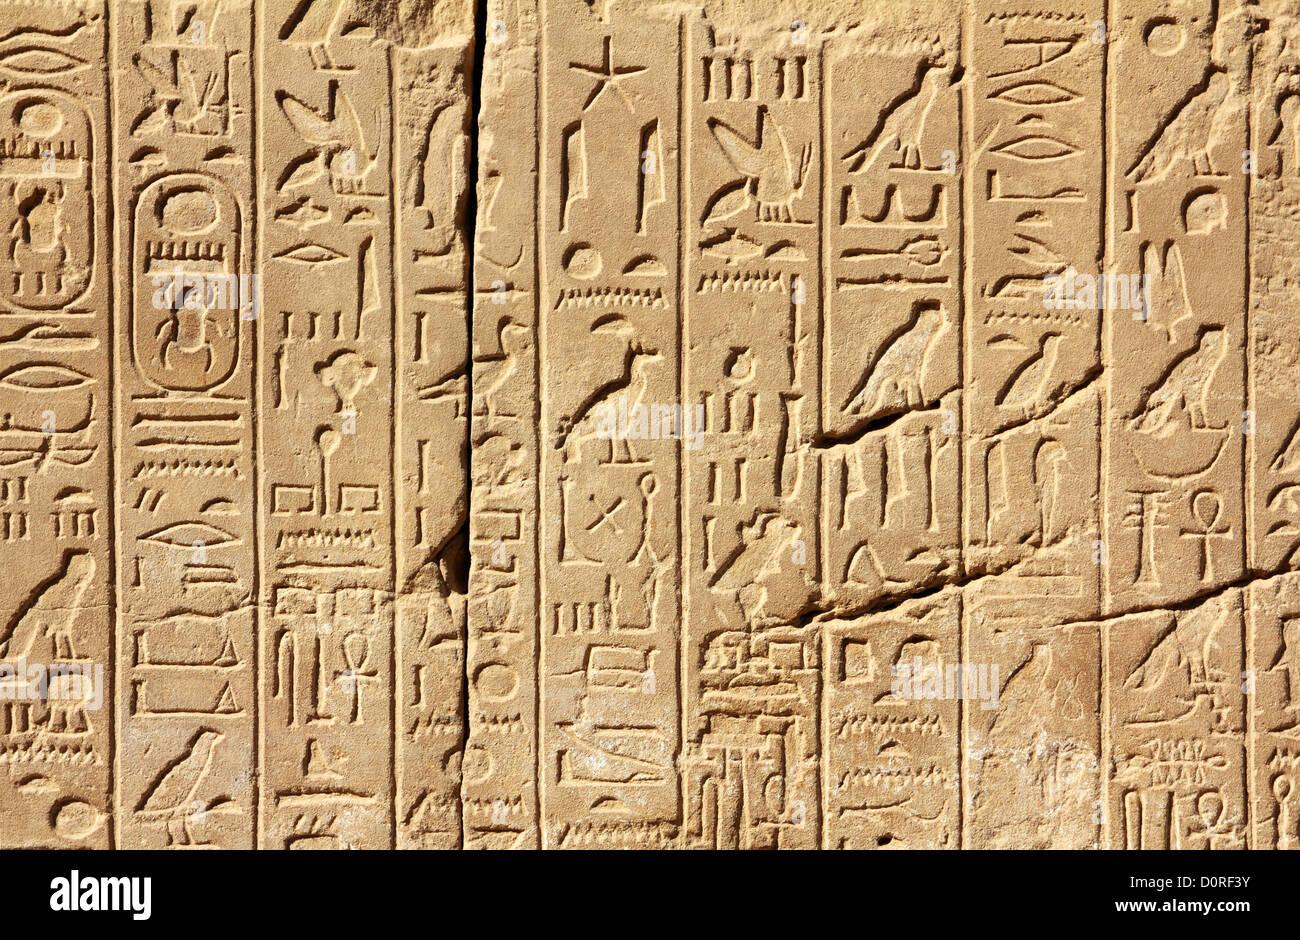 Ancient Egypt Hieroglyphics On Wall Stock Photo